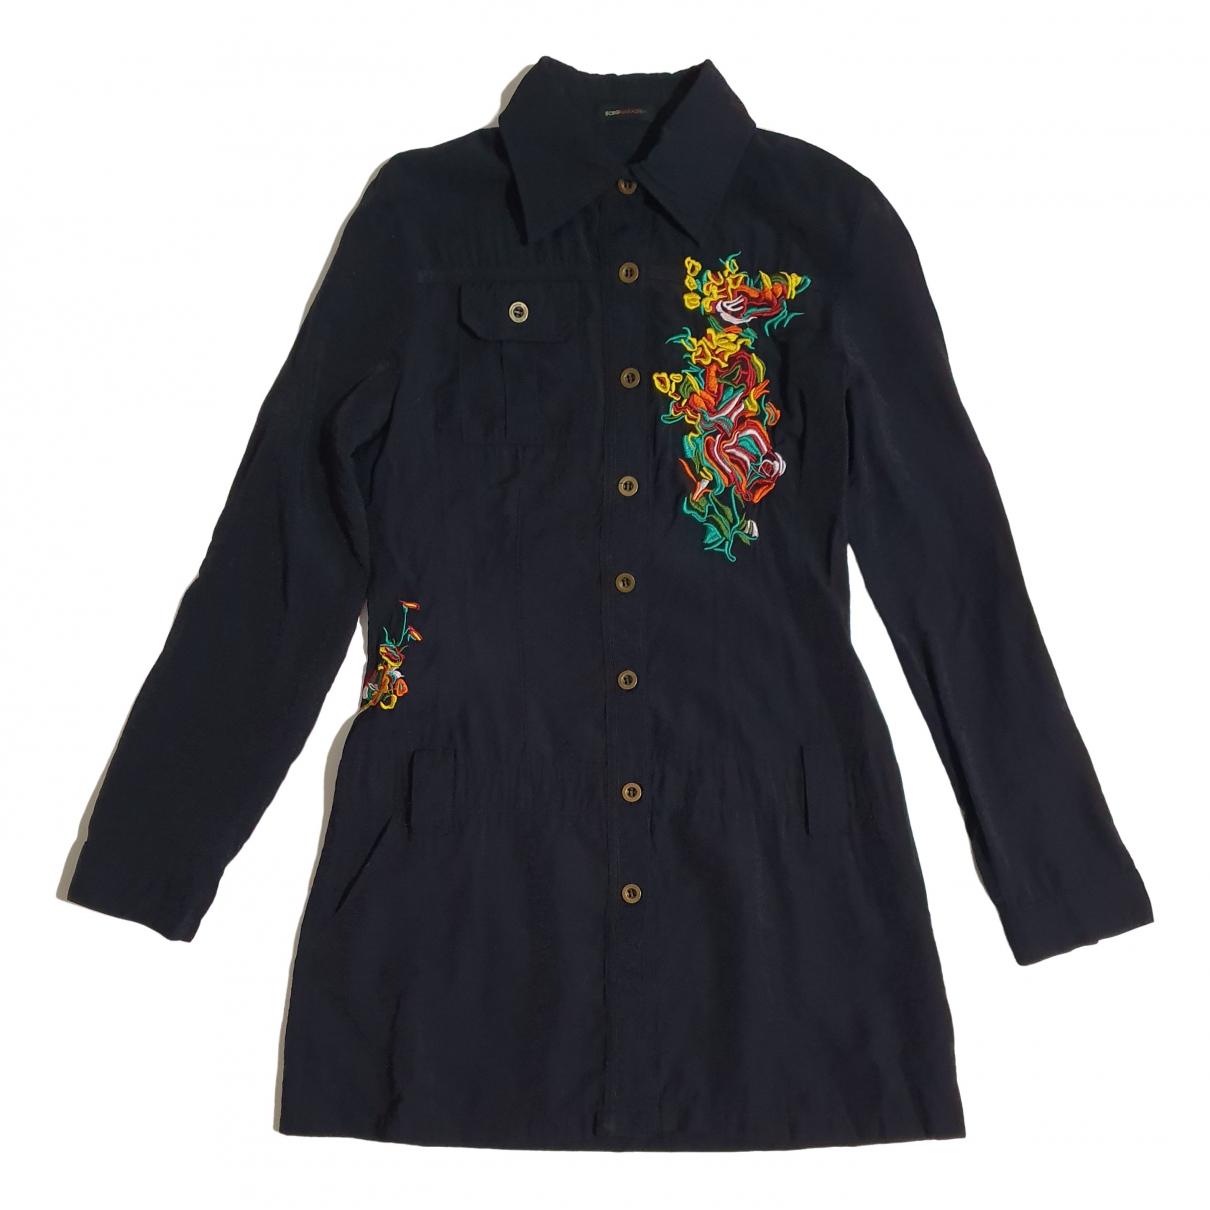 Bcbg Max Azria \N Multicolour Cotton  top for Women M International